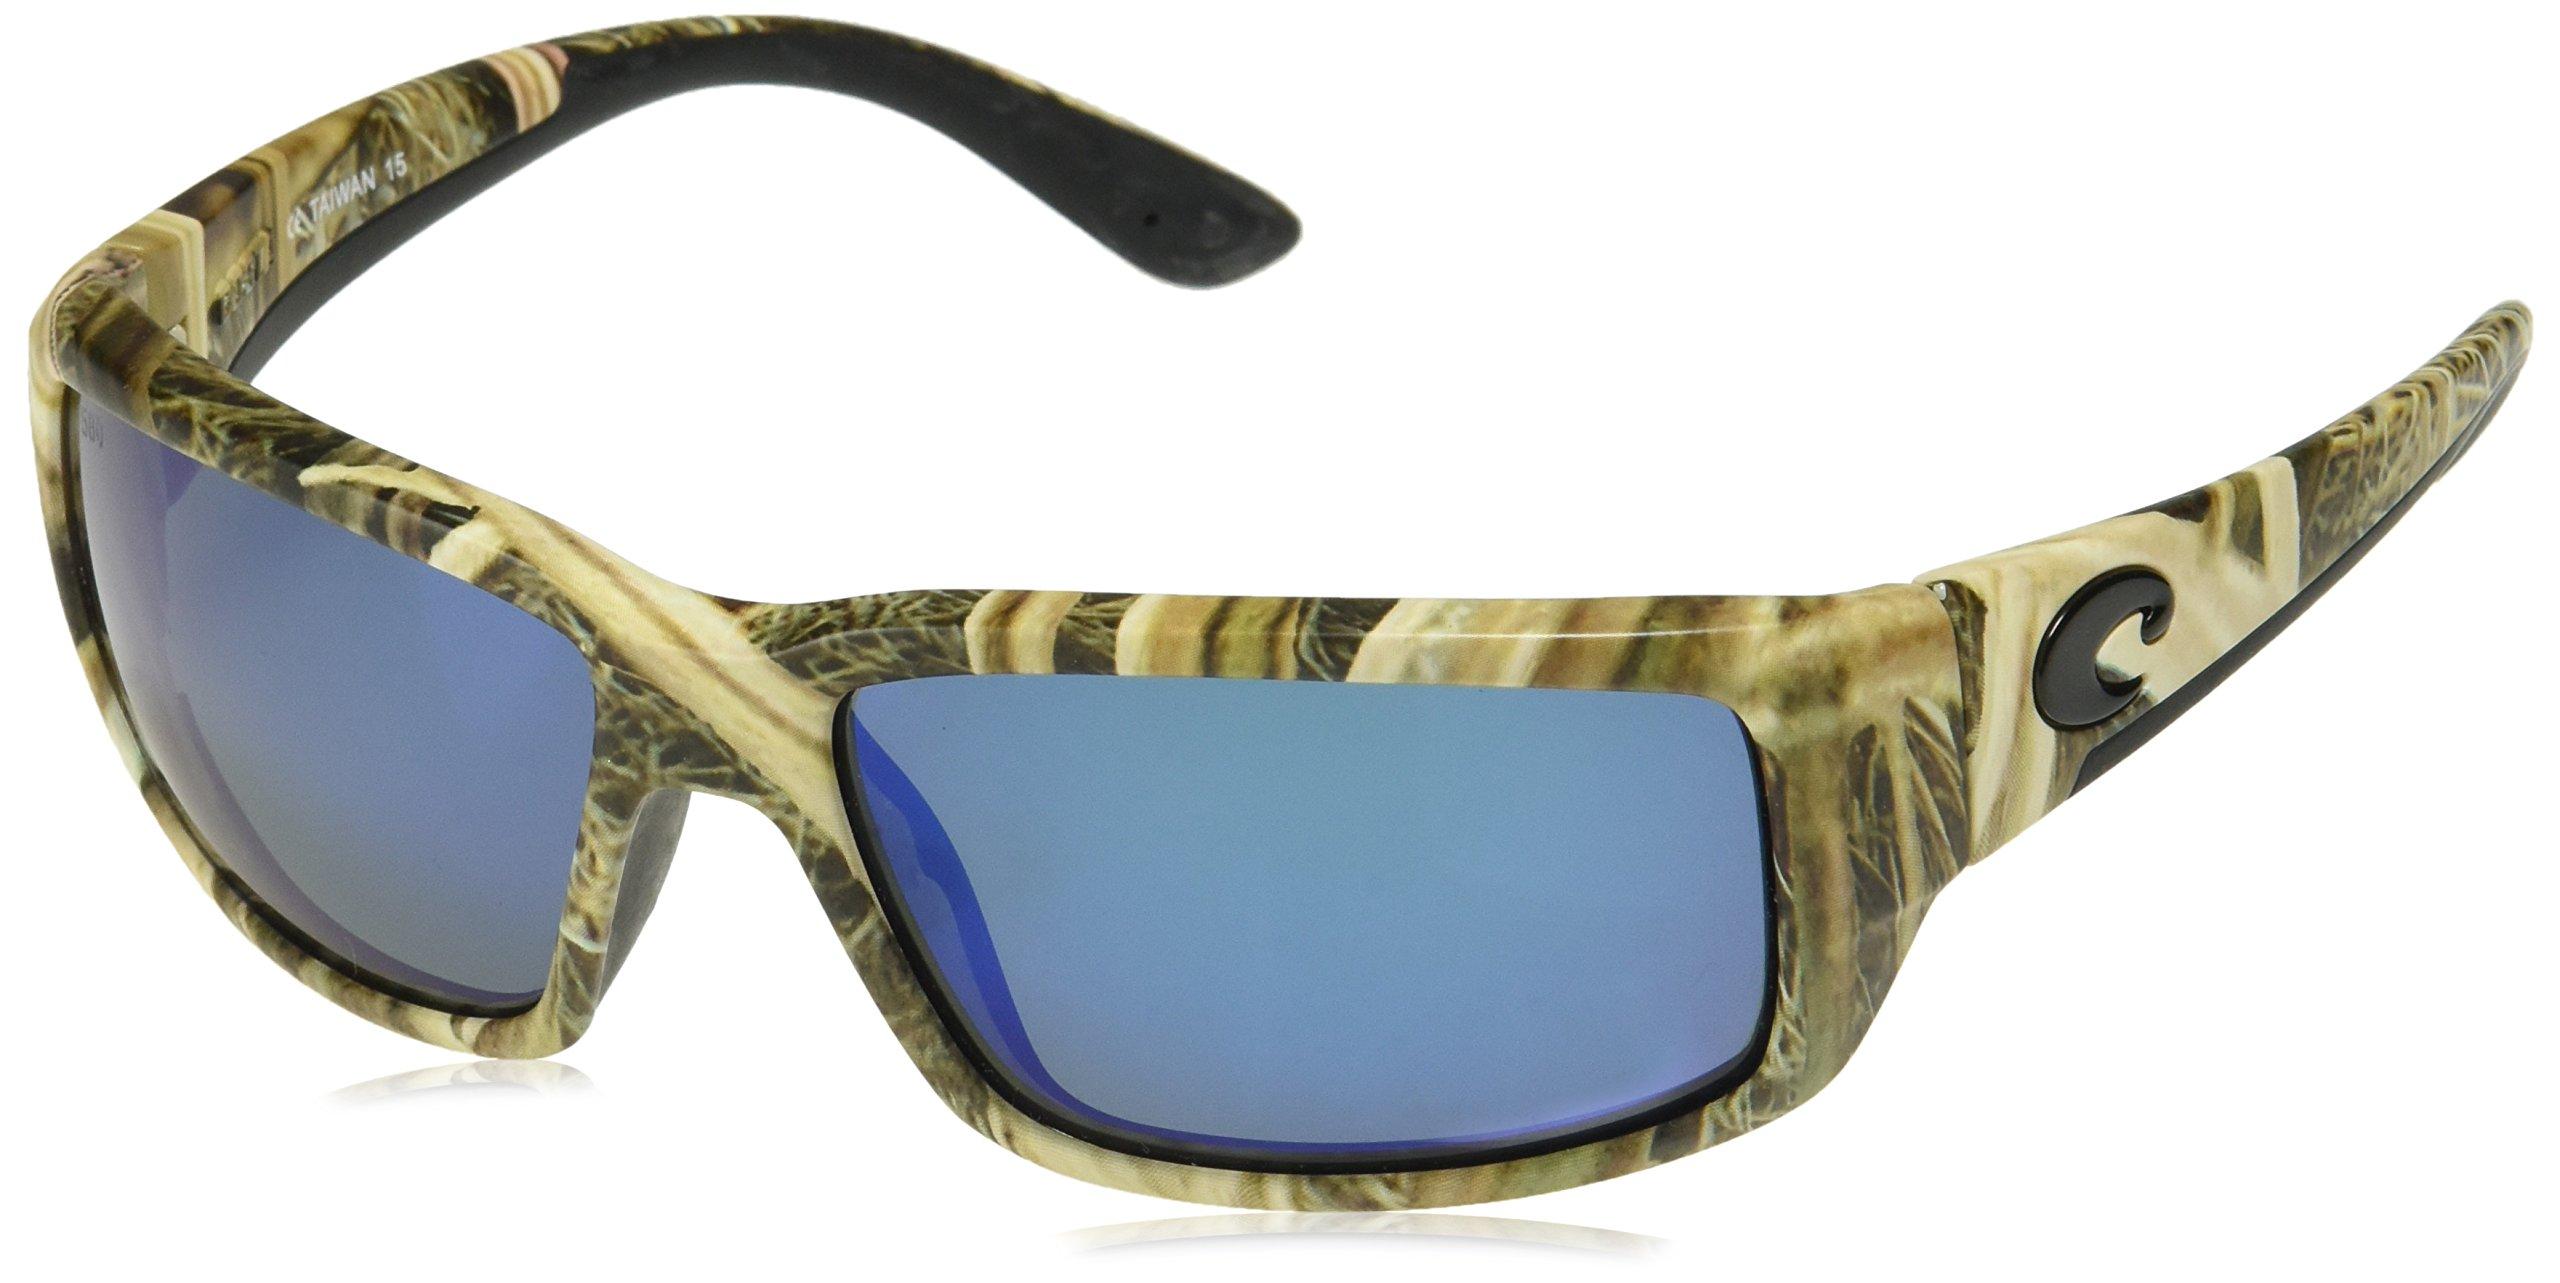 Costa Del Mar TF65OBMGLP Fantail Sunglasses, Mossy Oak Shadow Grass Blades Camo, Blue Mirror 580G Lens